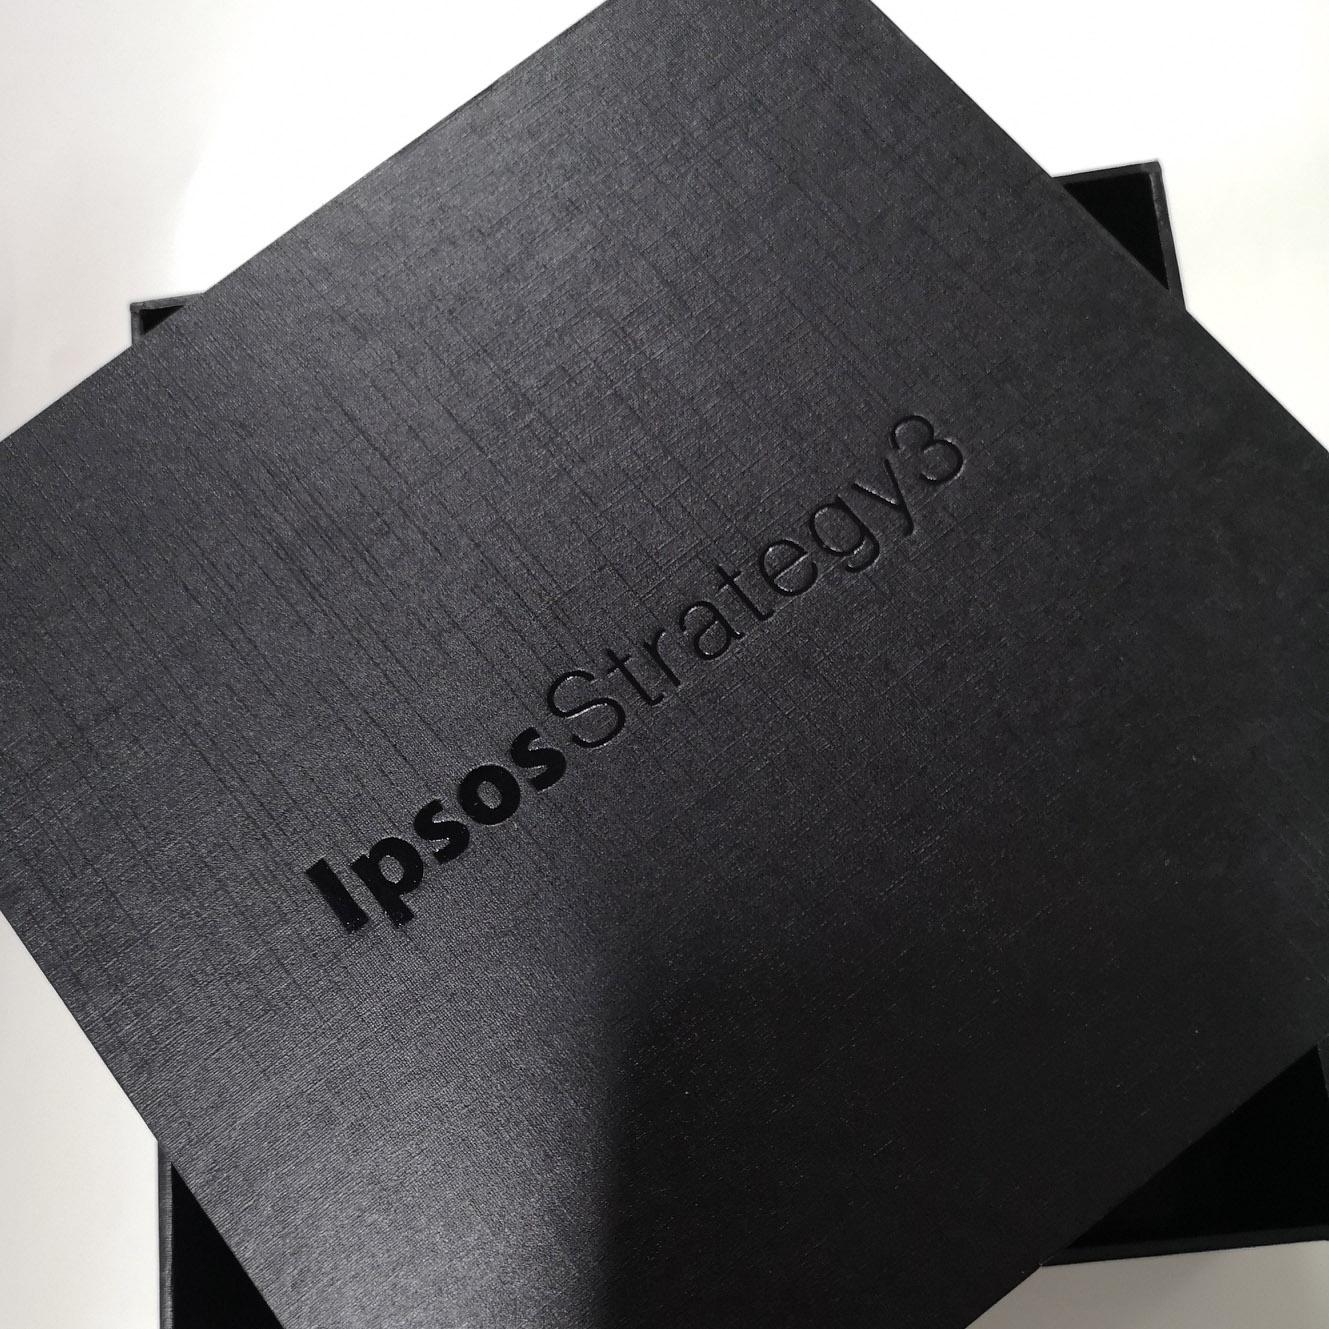 logo-foil-stamped-box